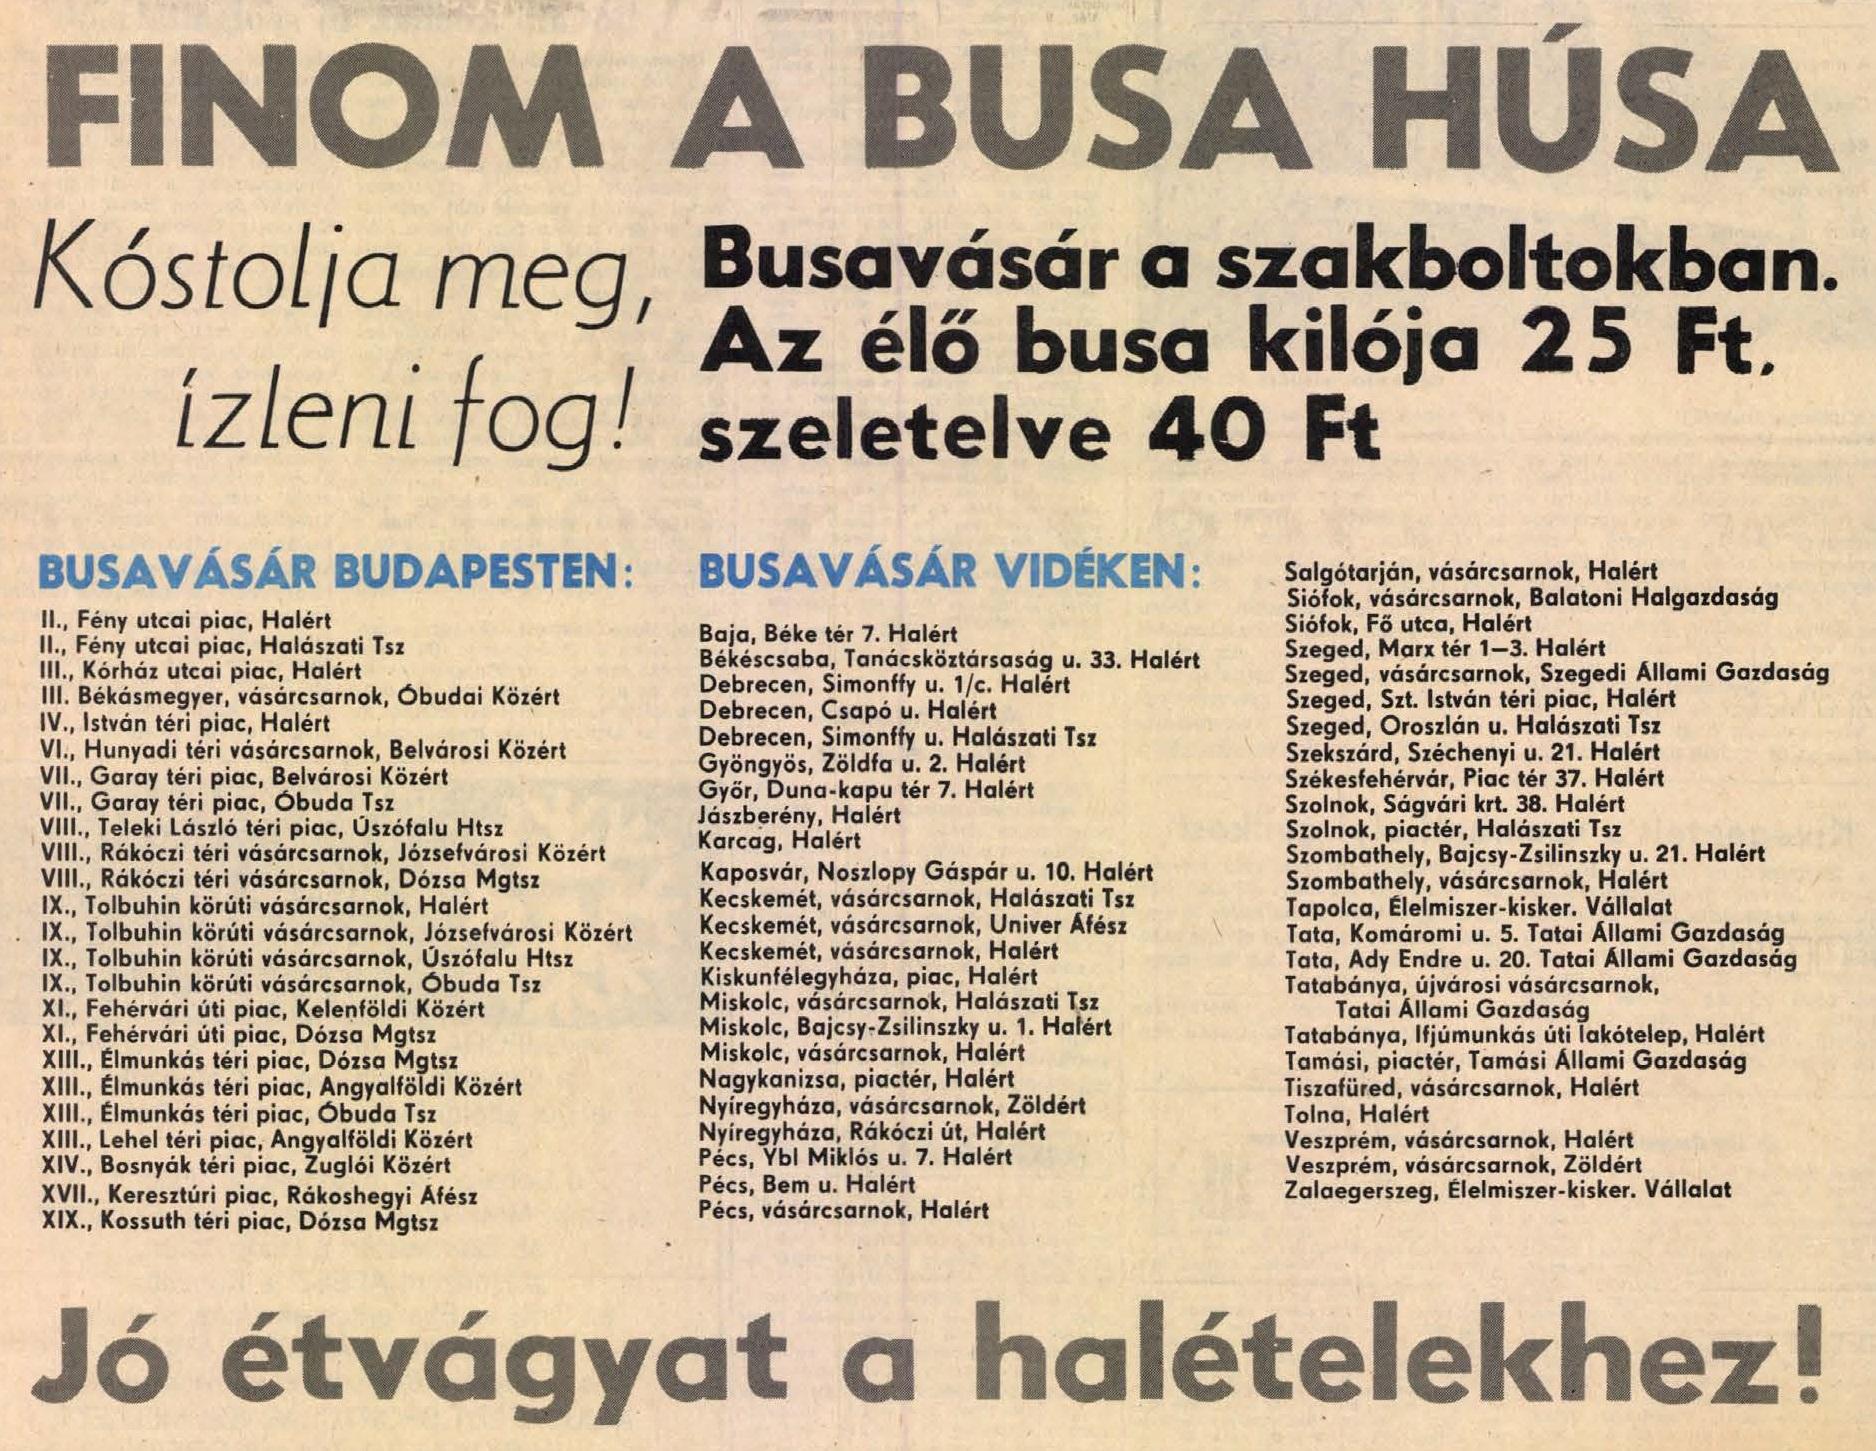 idokapszula_nb_i_1983_84_gorogorszag_magyarorszag_eb-selejtezo_reklam_2.jpg